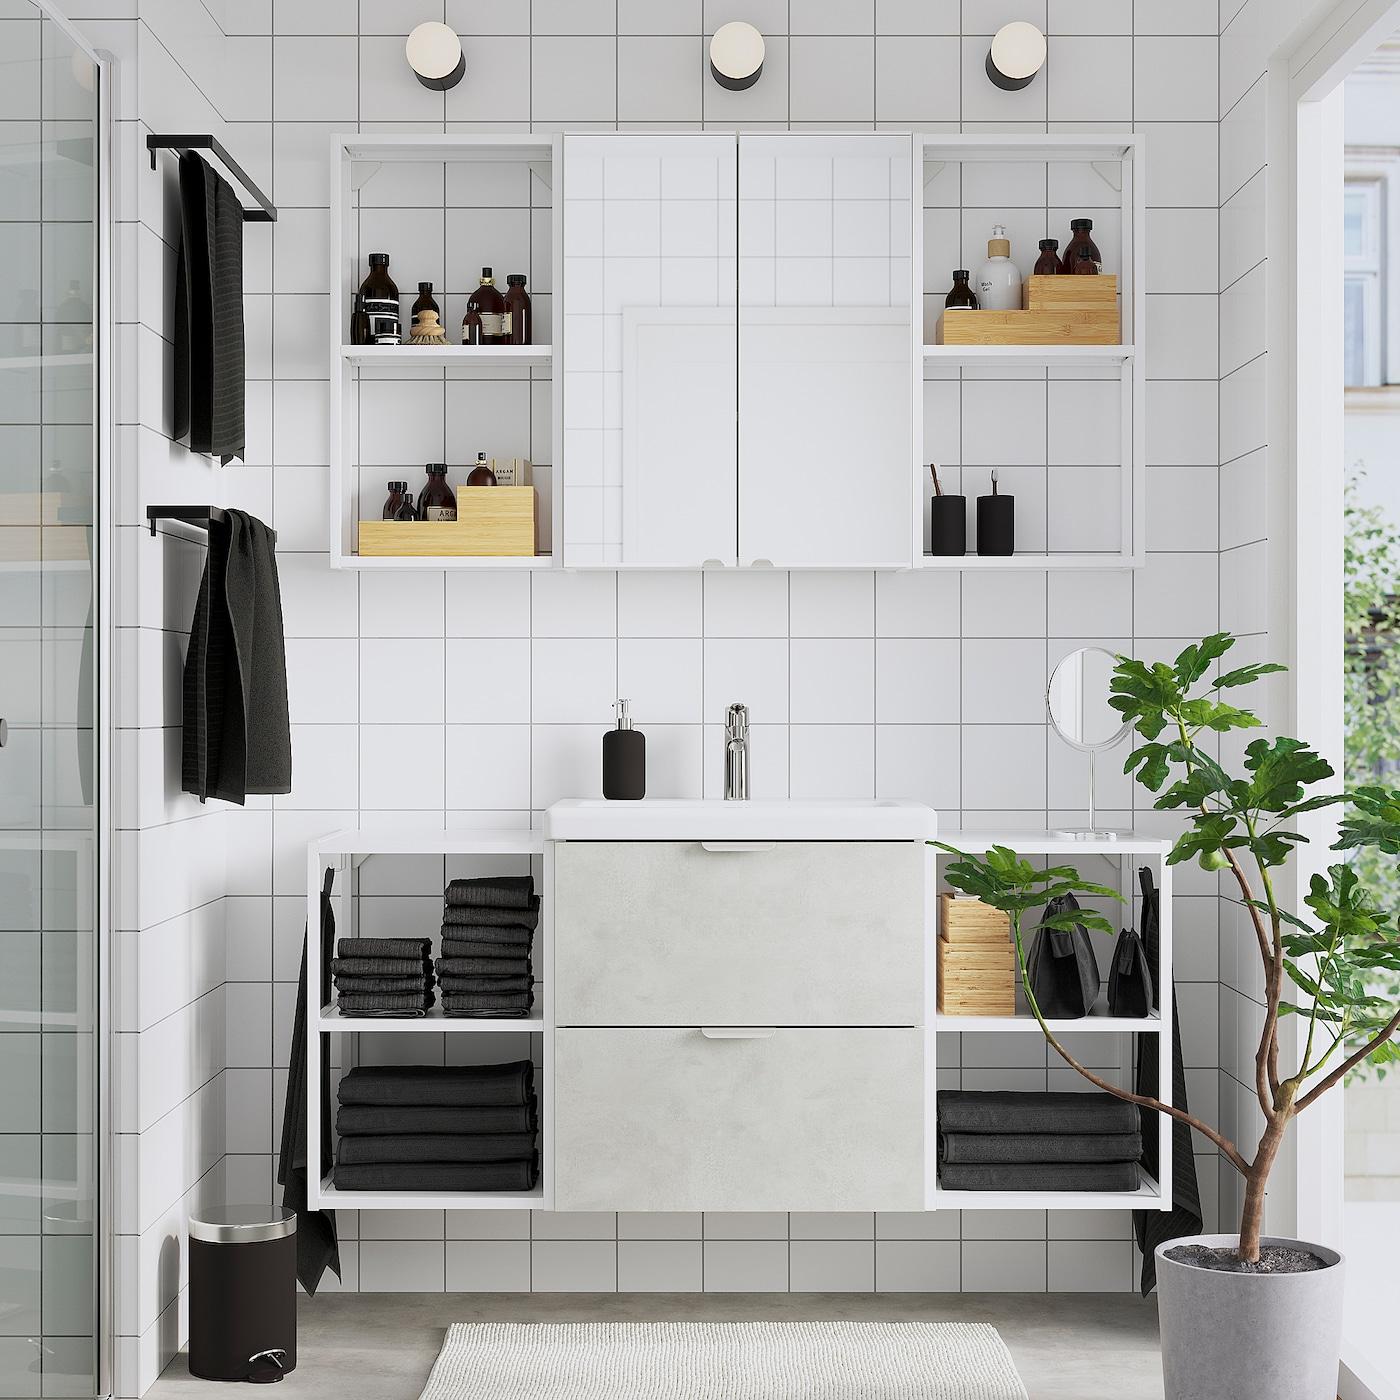 ENHET / TVÄLLEN Bathroom furniture, set of 18, concrete effect/white Brogrund tap, 140x43x65 cm